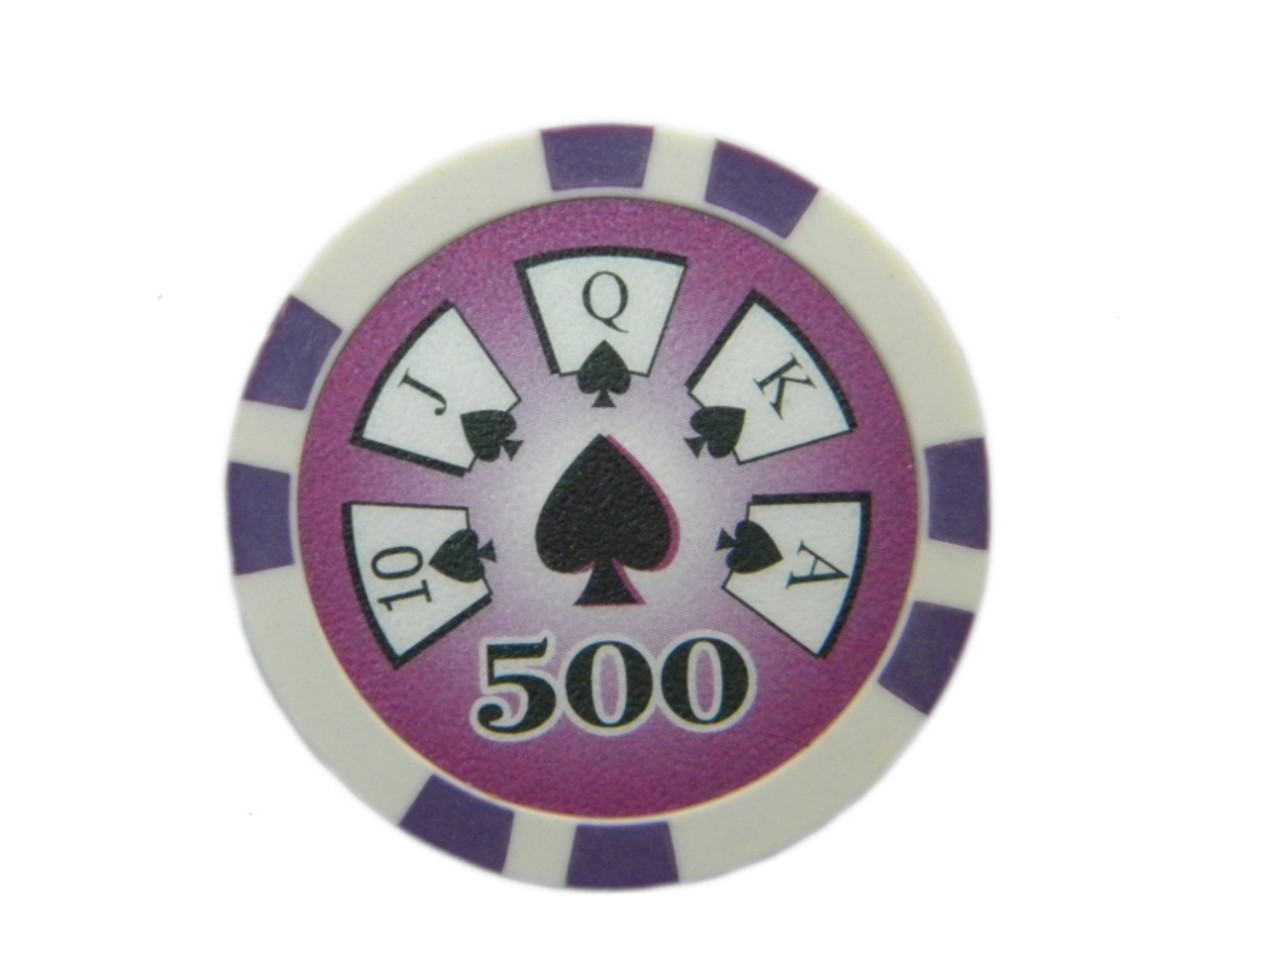 Fisic 25 jetoane Royal Flush - Mov - Valoare printata : 500